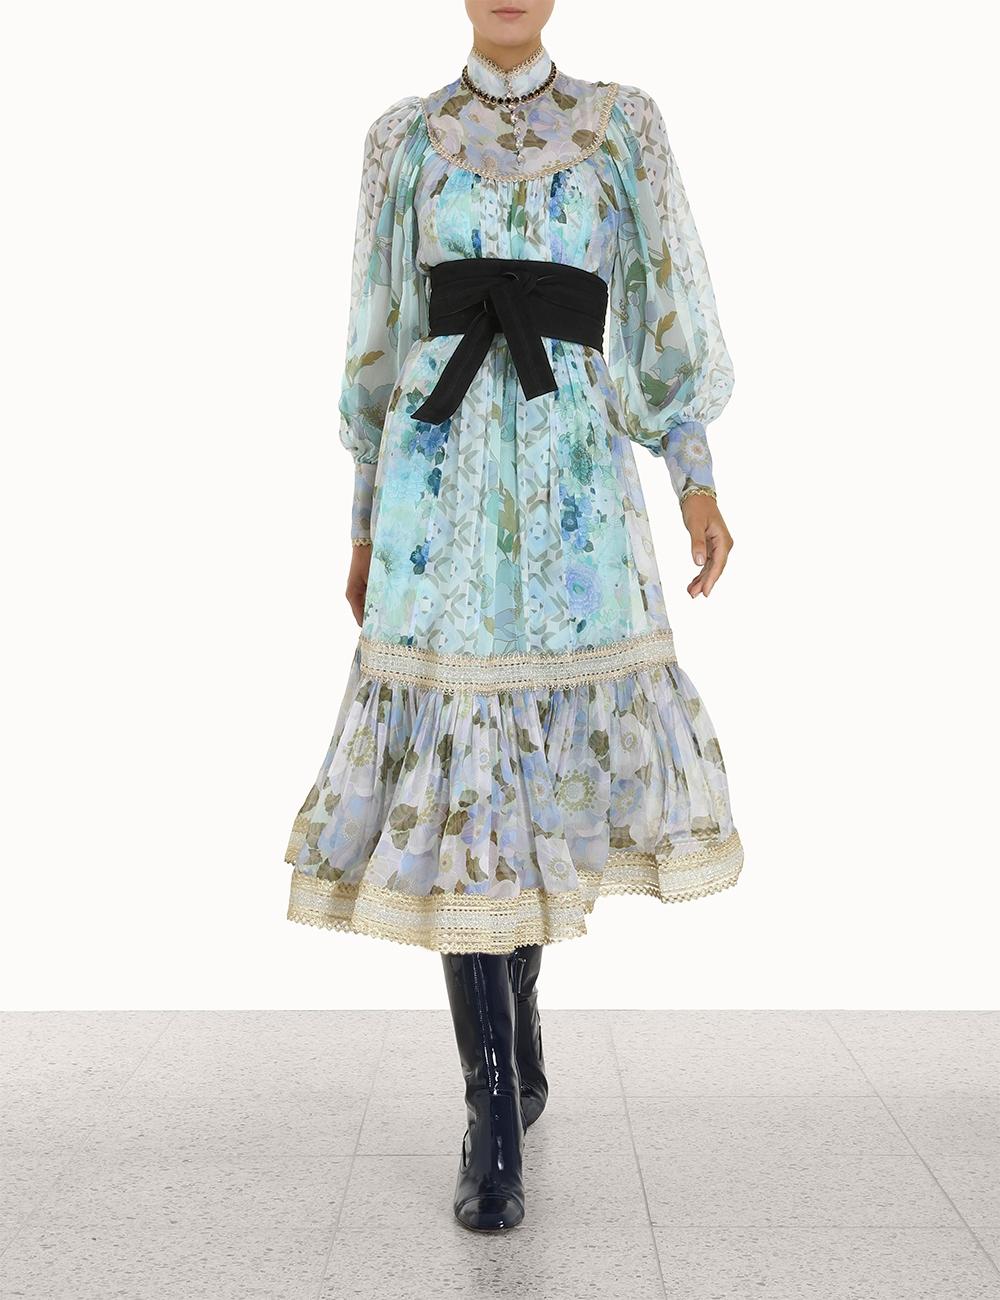 Rhythm Trimmed Billow Dress